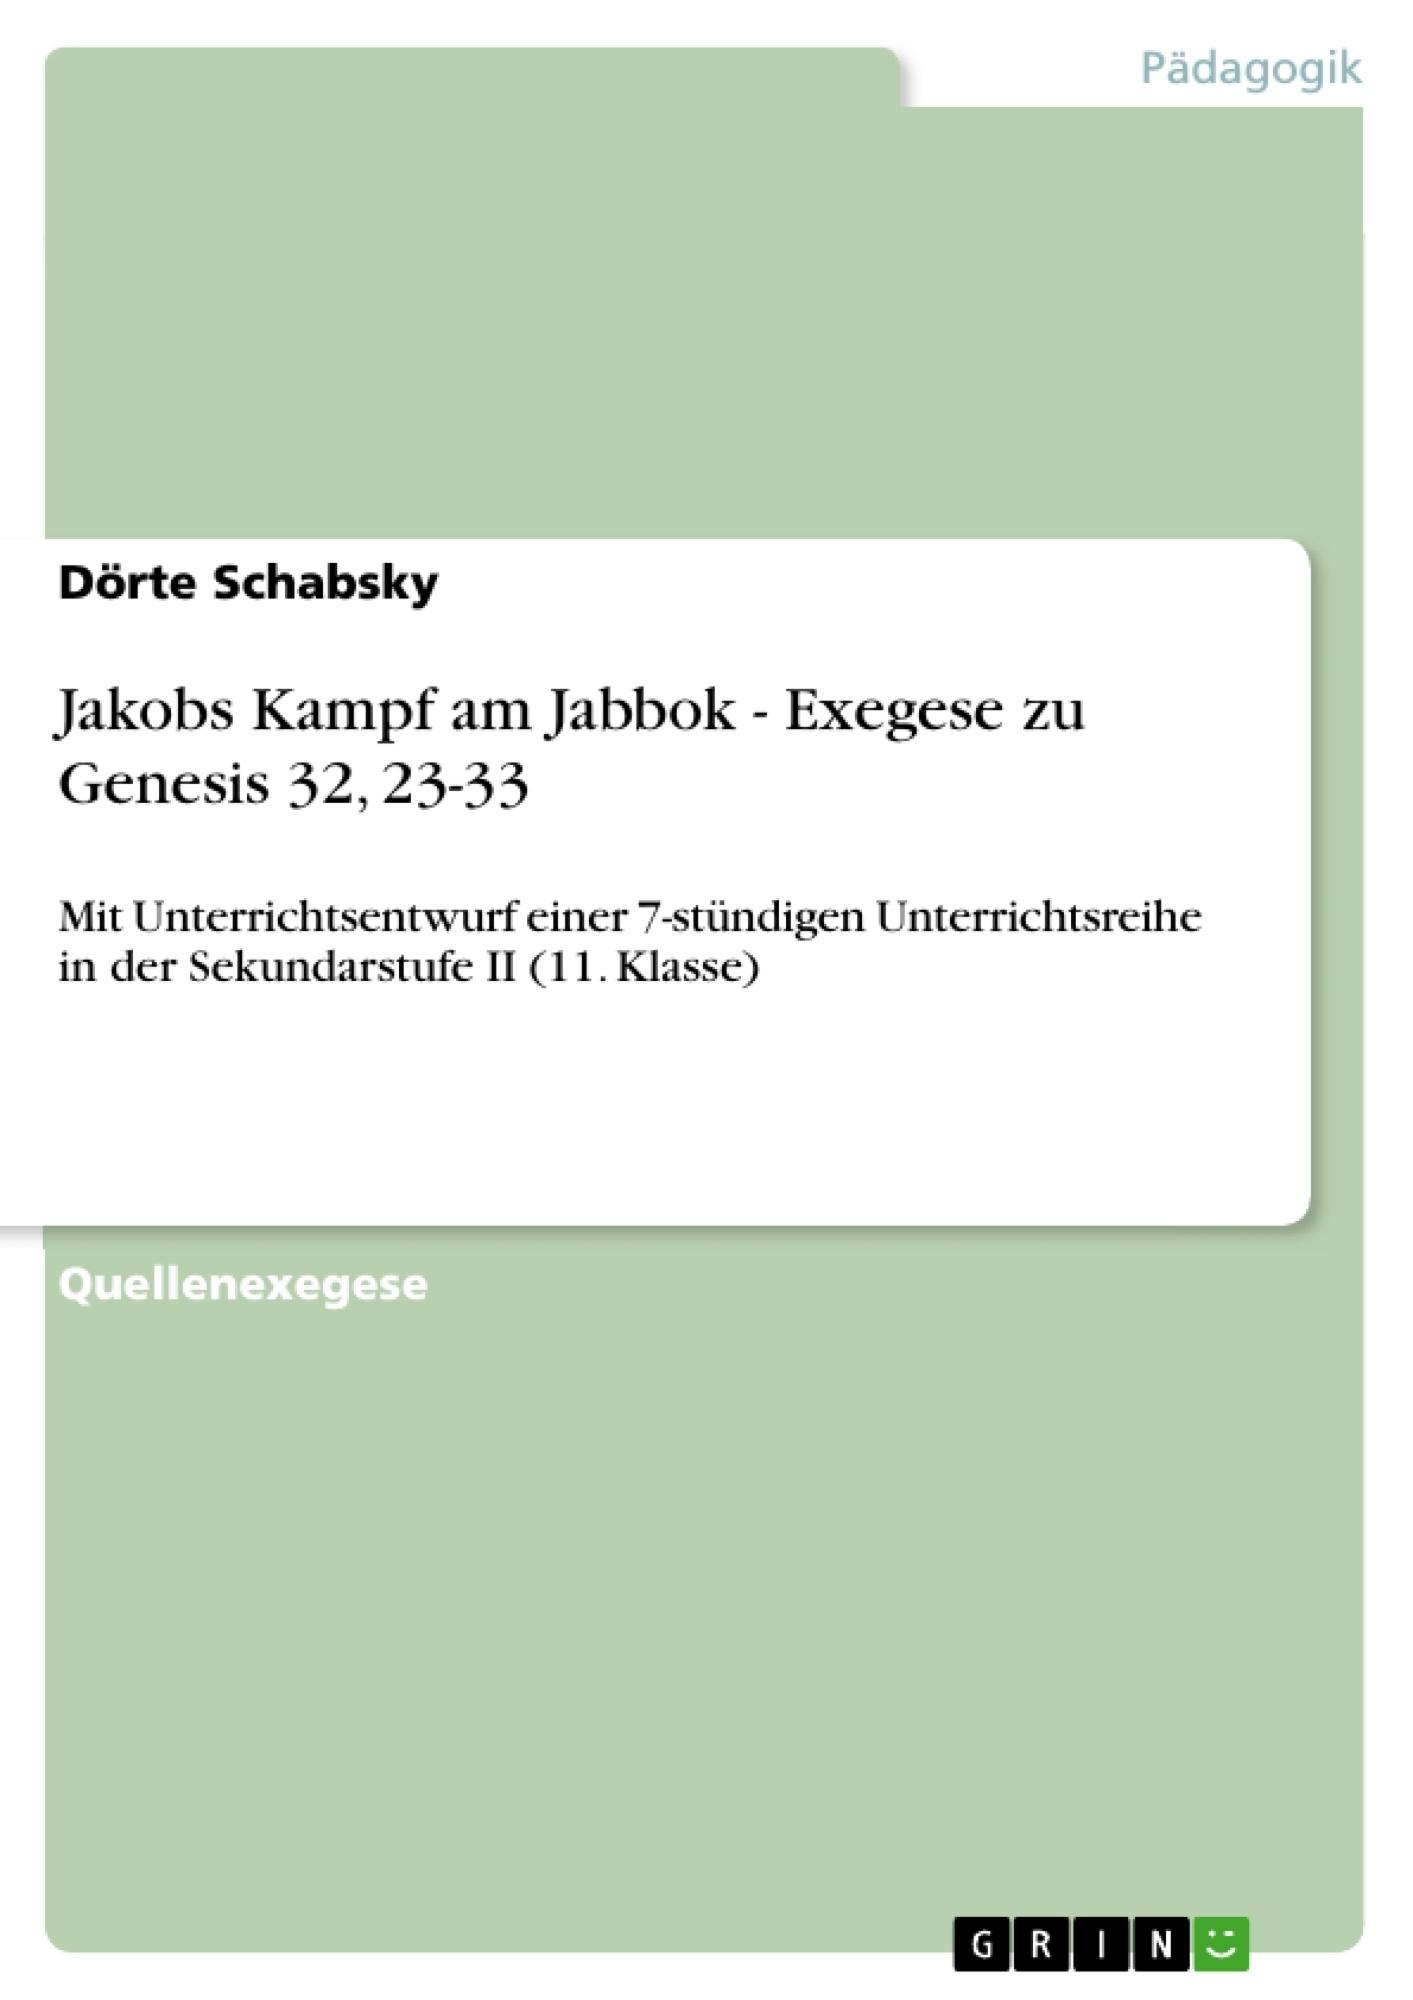 Titel: Jakobs Kampf am Jabbok - Exegese zu Genesis 32, 23-33